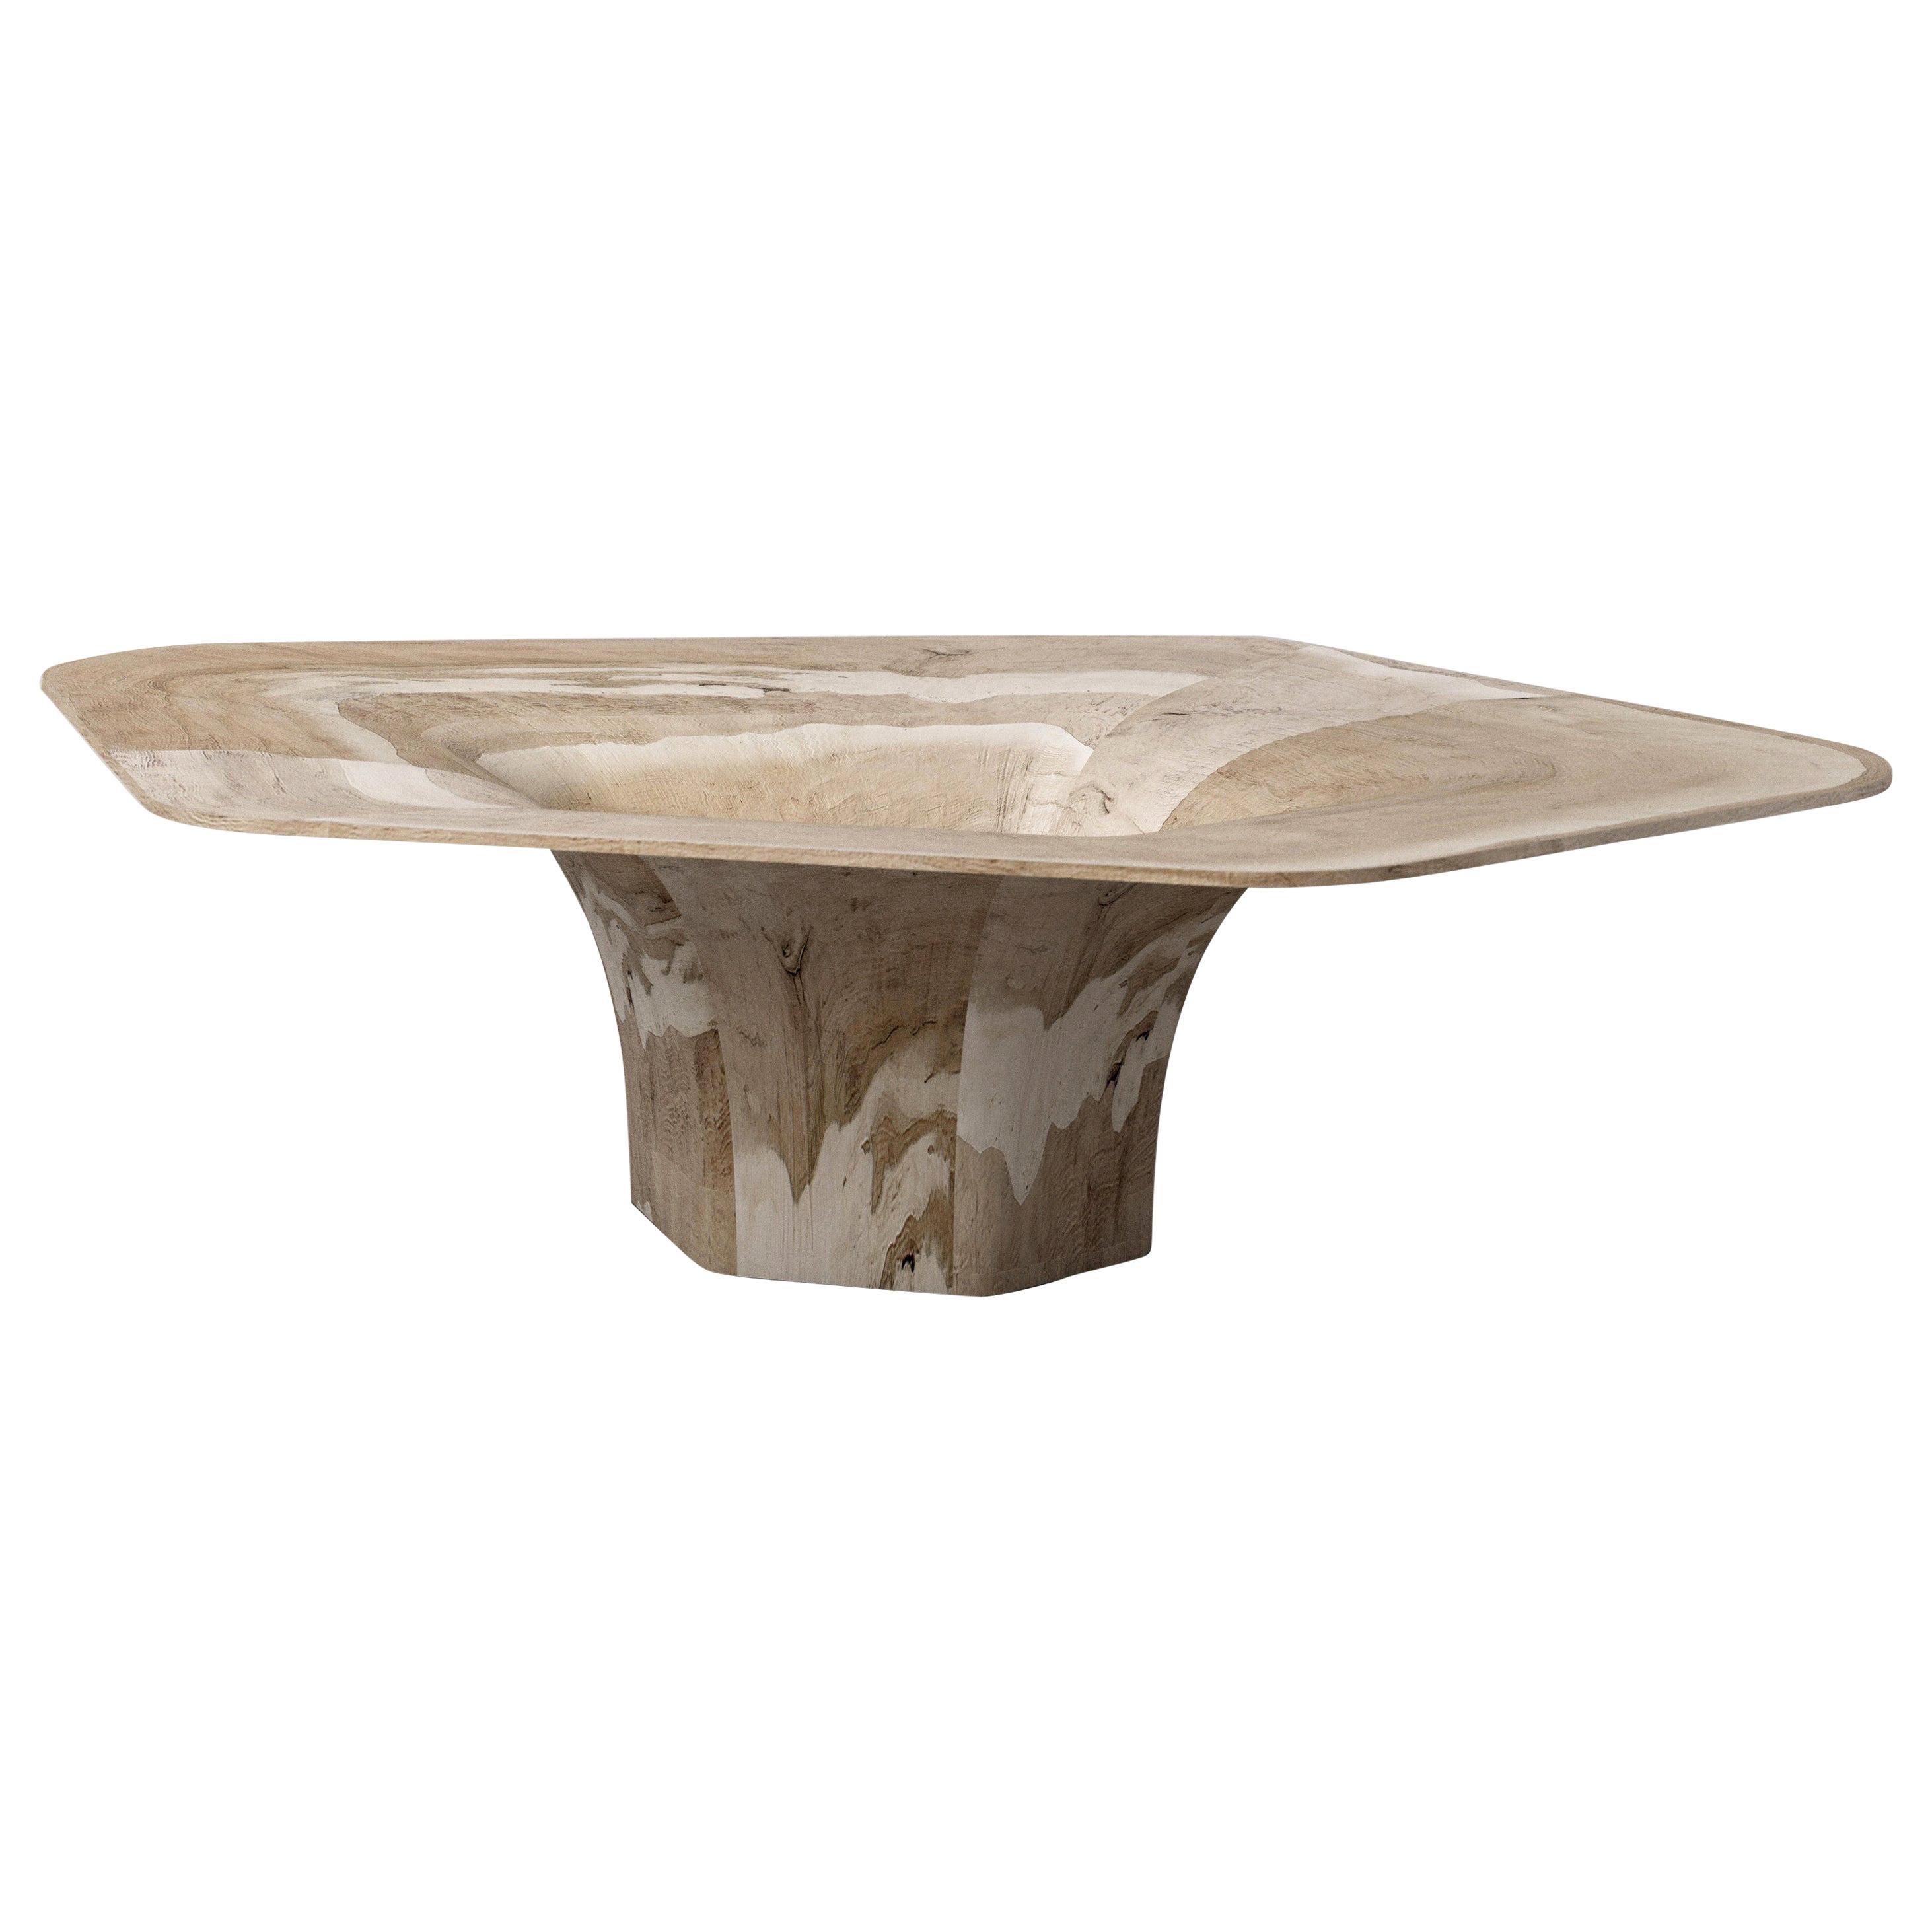 Sculptural Dune Coffee Table by Pietro Franceschini